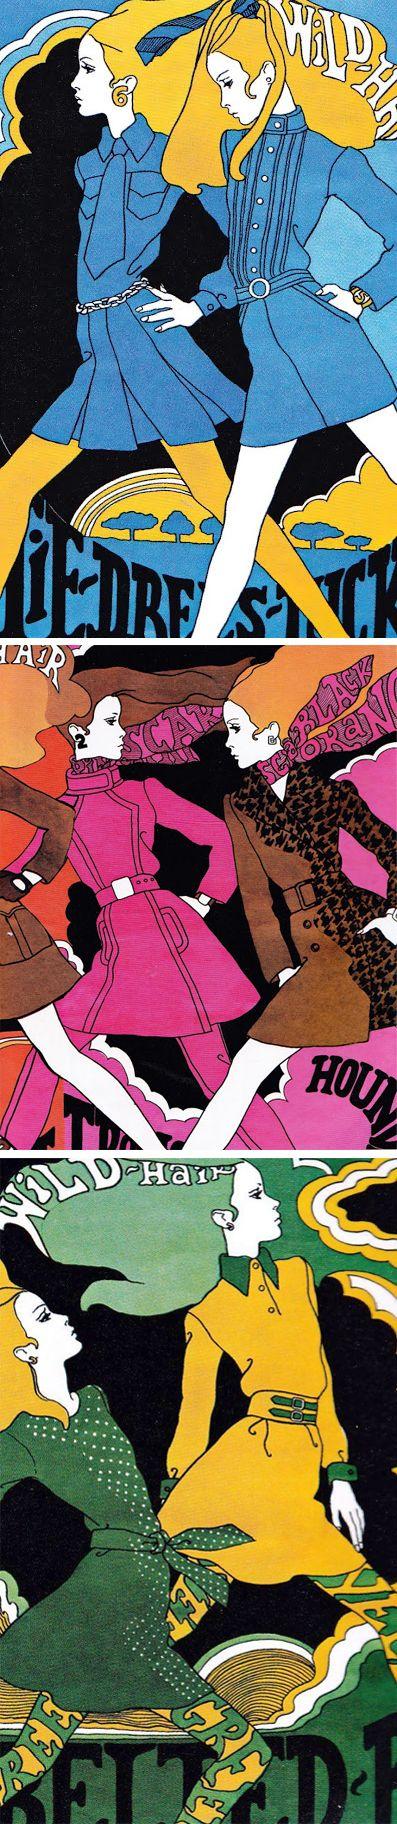 Illustrations by Antonio Lopez, originally for Intro Magazine 1967. ( retro fashion illustration / 60s / Psychedelic Art / Retro Design )